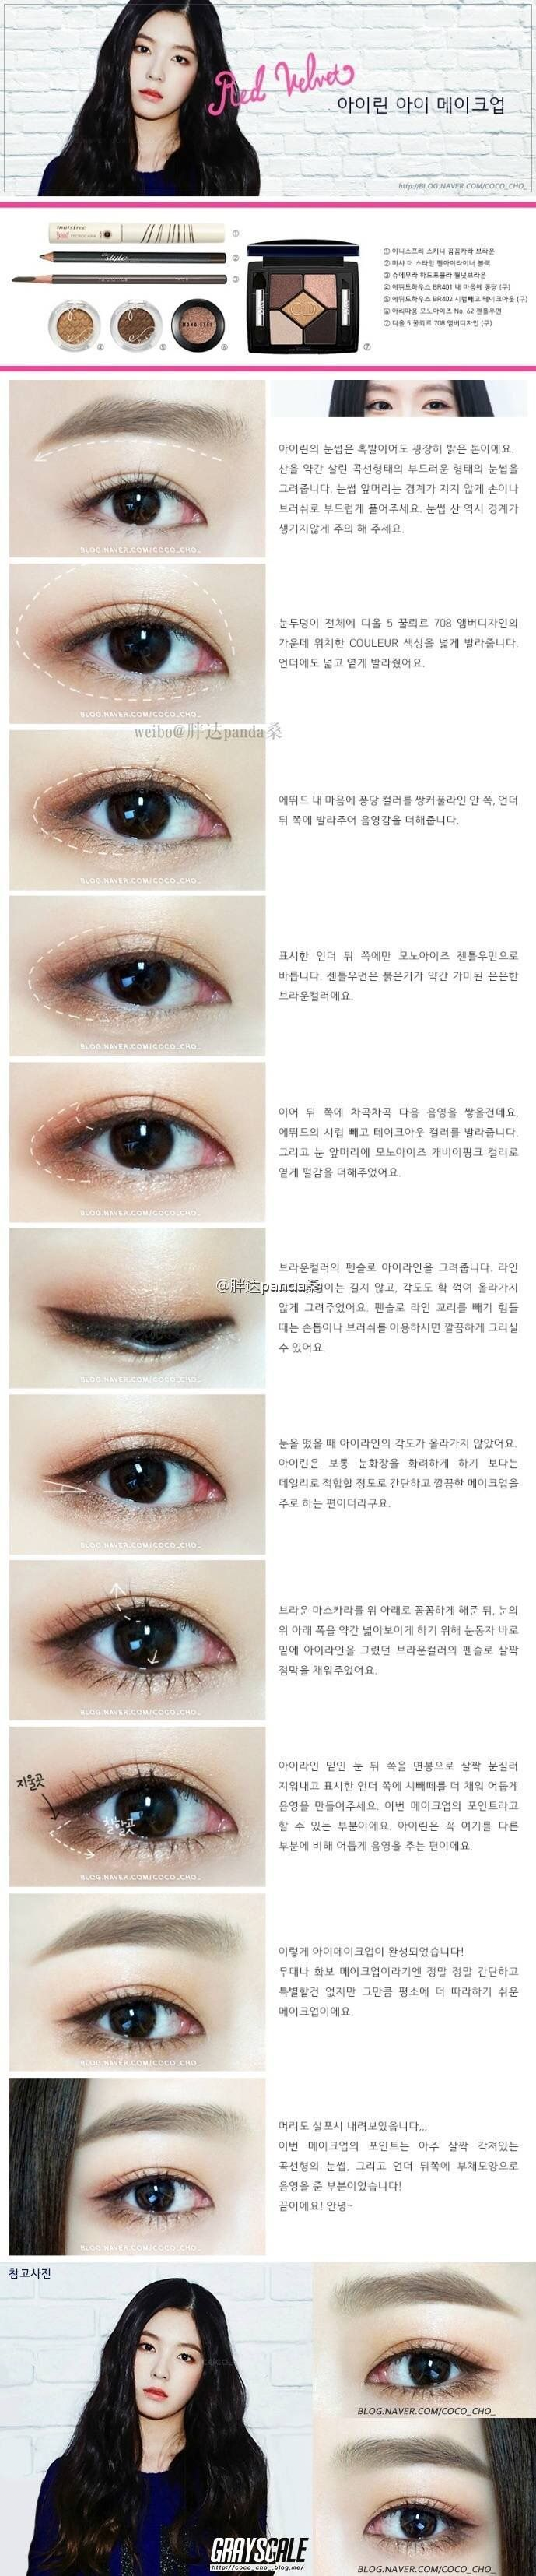 Red Velvet Irene Be Natural Korean Kpop Idol Makeup Tutorial Cr Coco Cho Blog Me Koreanmakeuptutorials Ulzzang Makeup Korean Eye Makeup Asian Eye Makeup